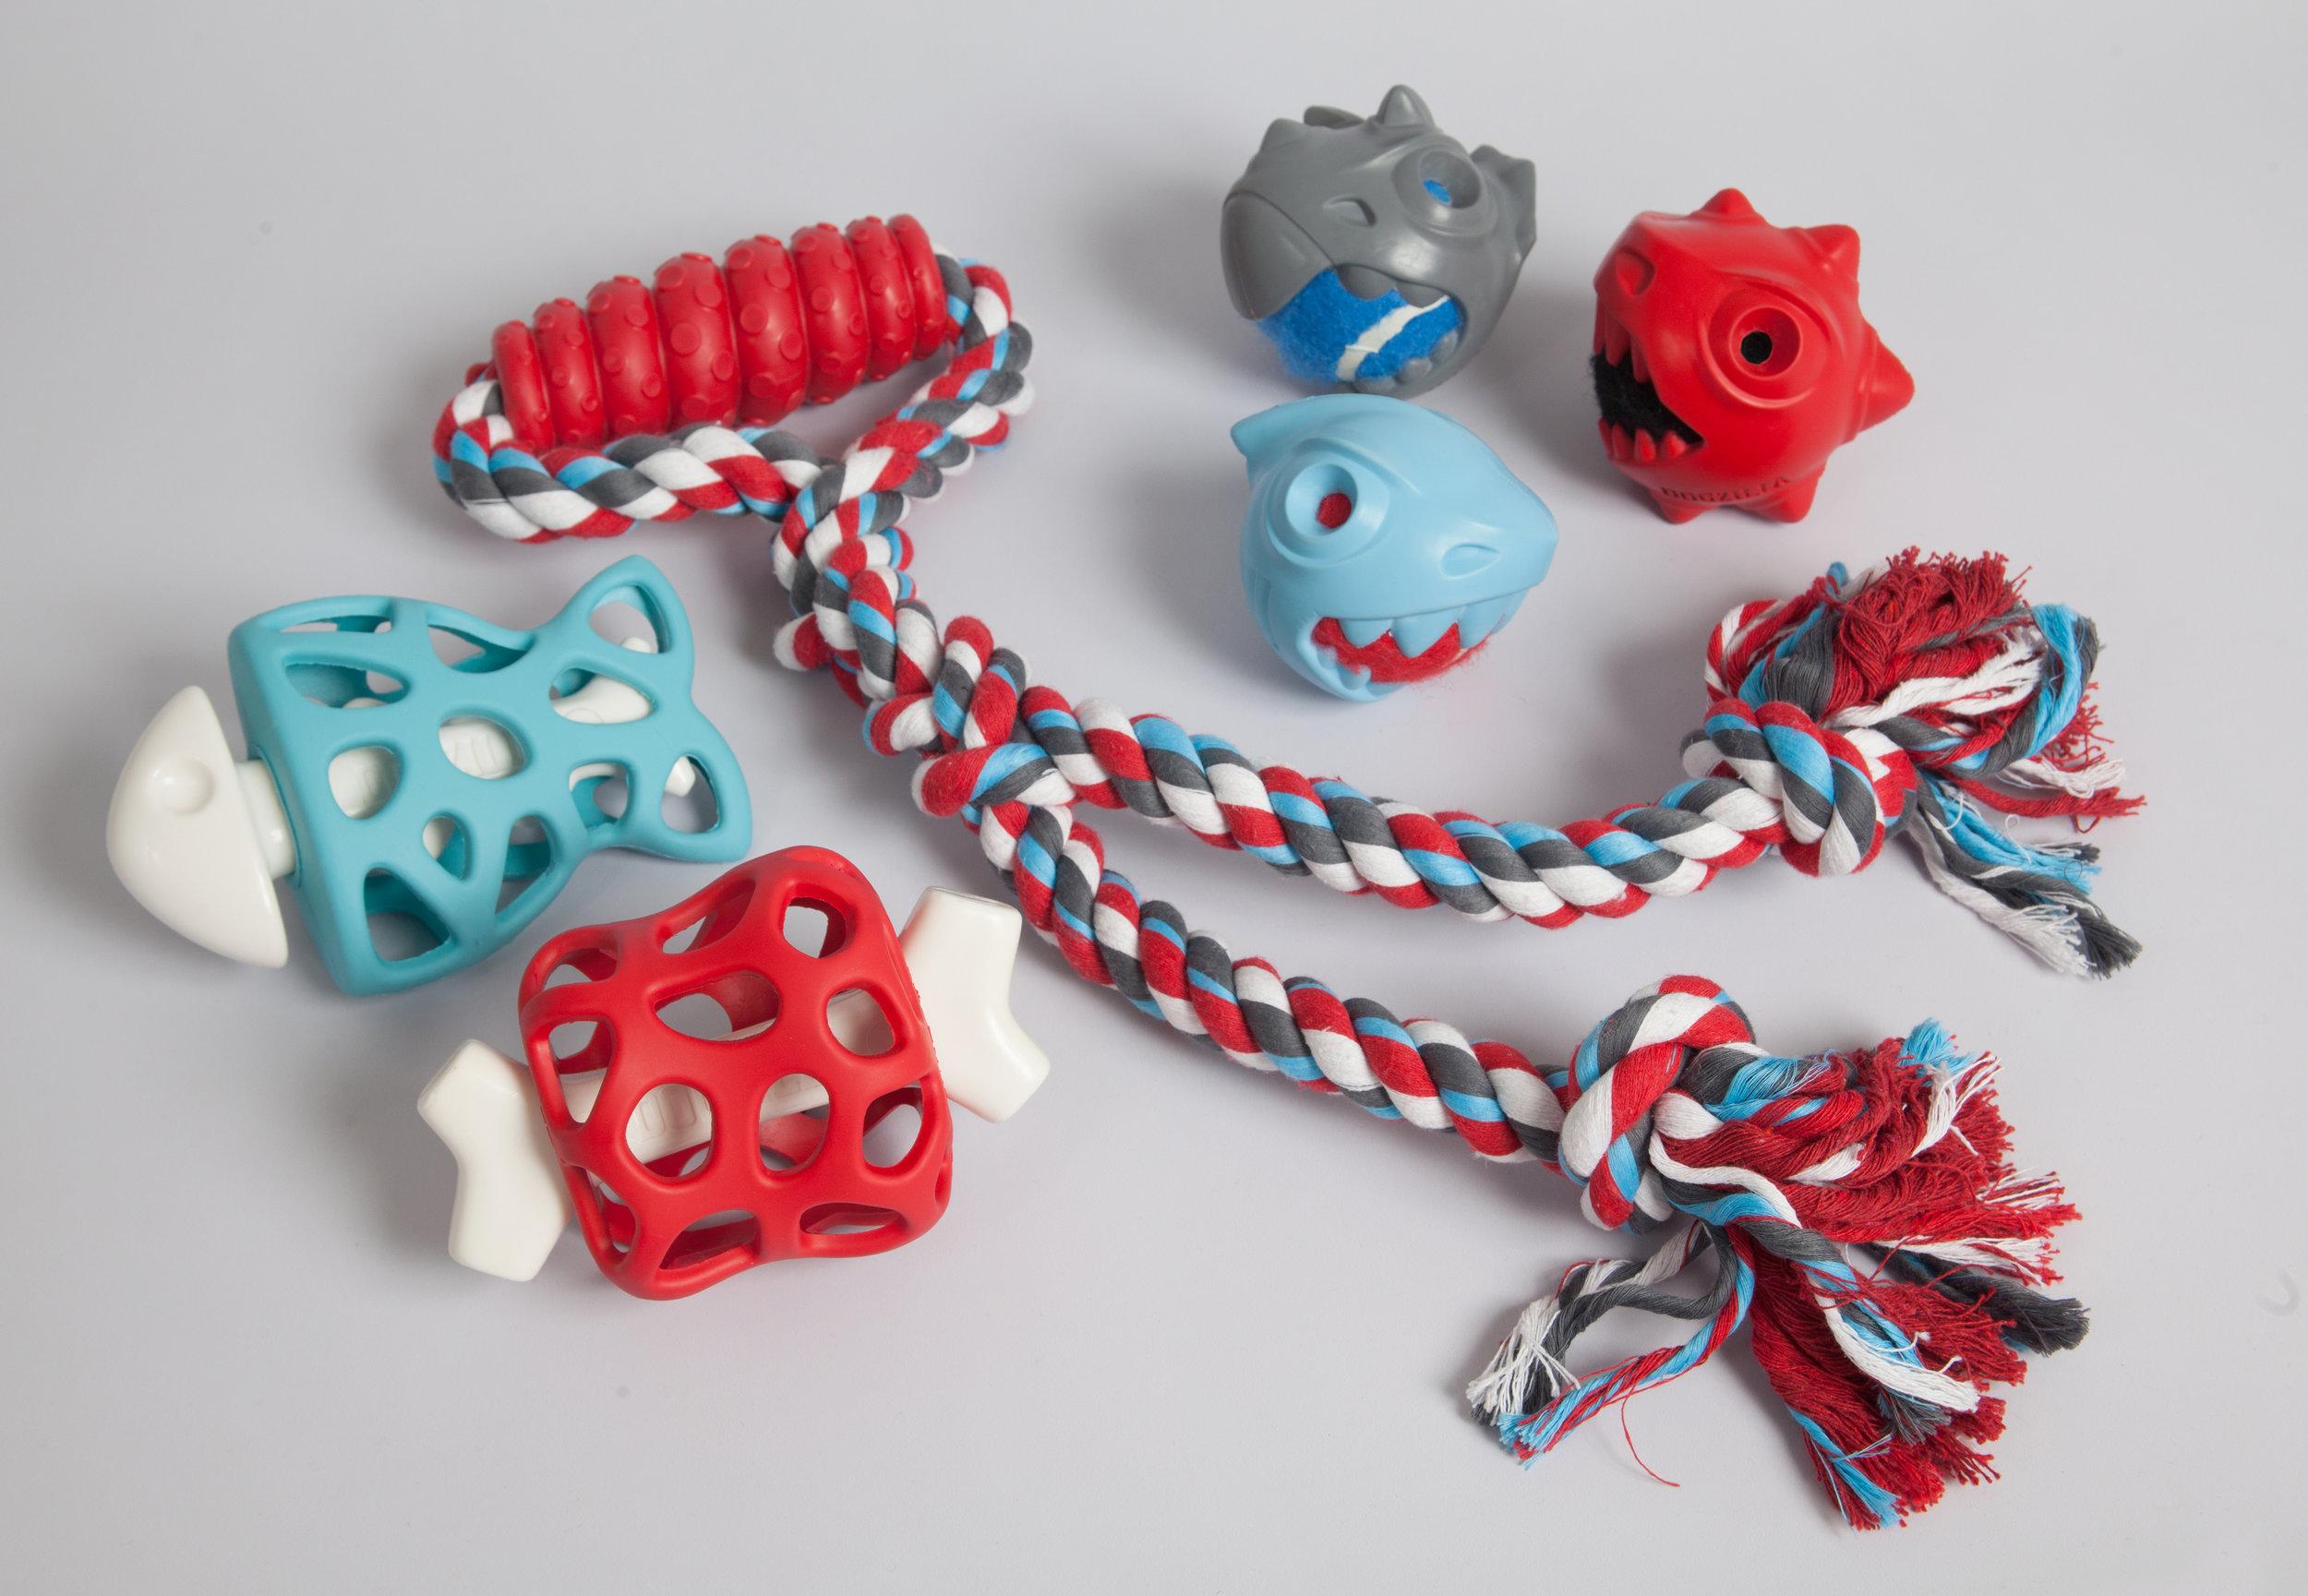 dogzilla-dog-toys-all-nicholas-baker.jpg